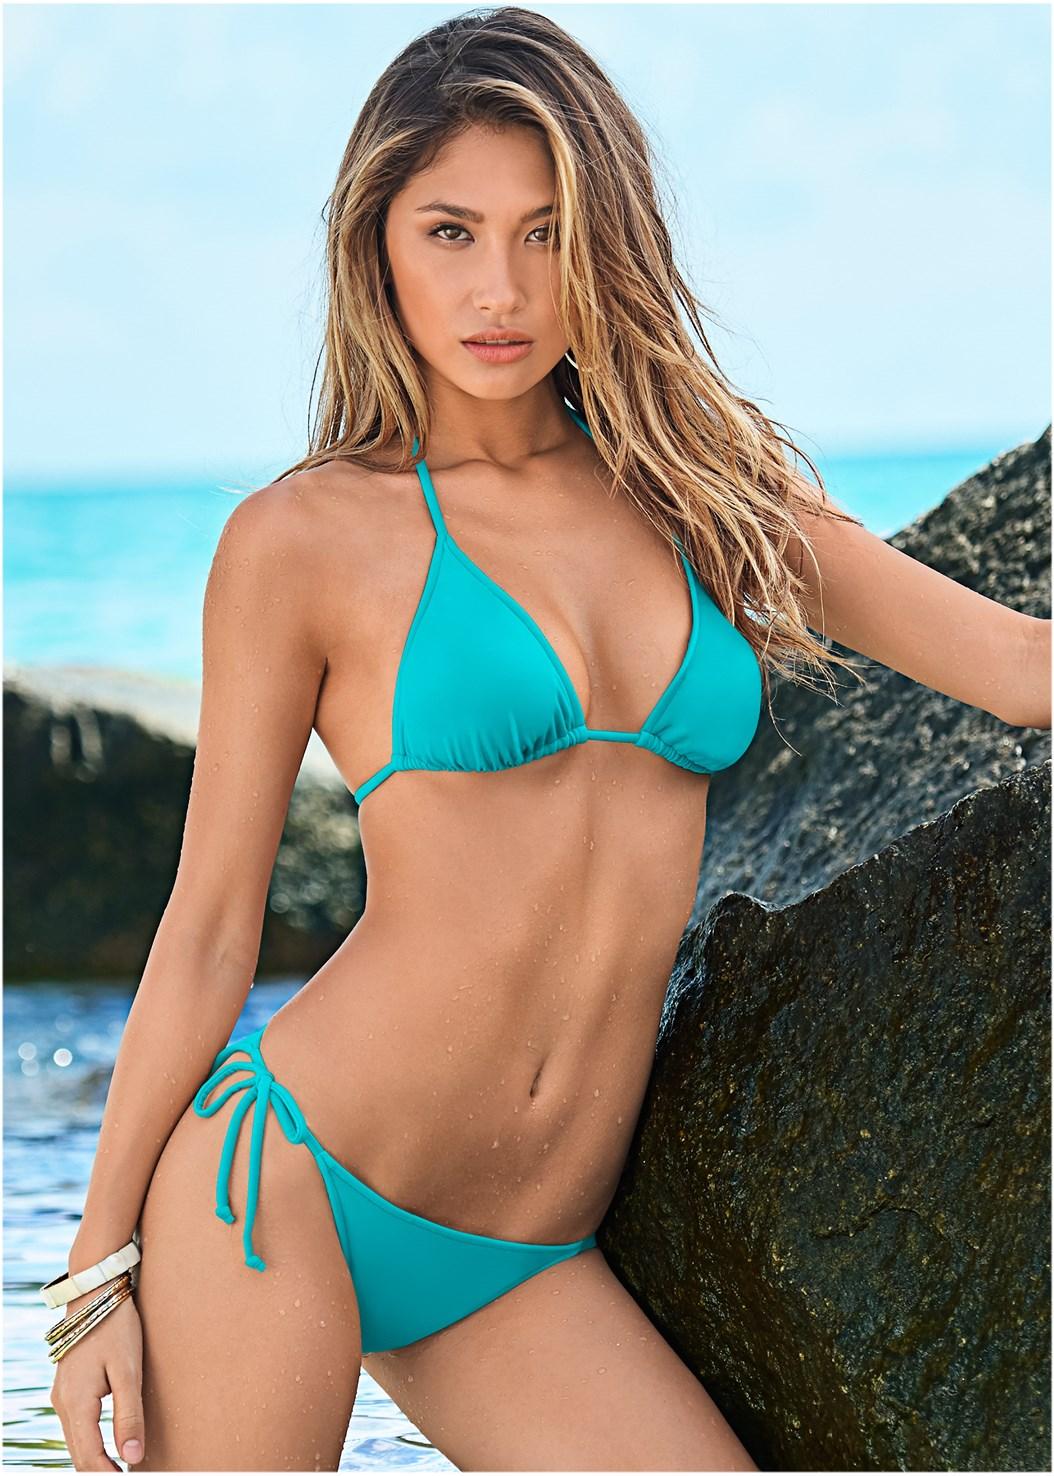 Triangle String Bikini Top,String Side Bikini Bottom,Scoop Front Classic Bikini Bottom